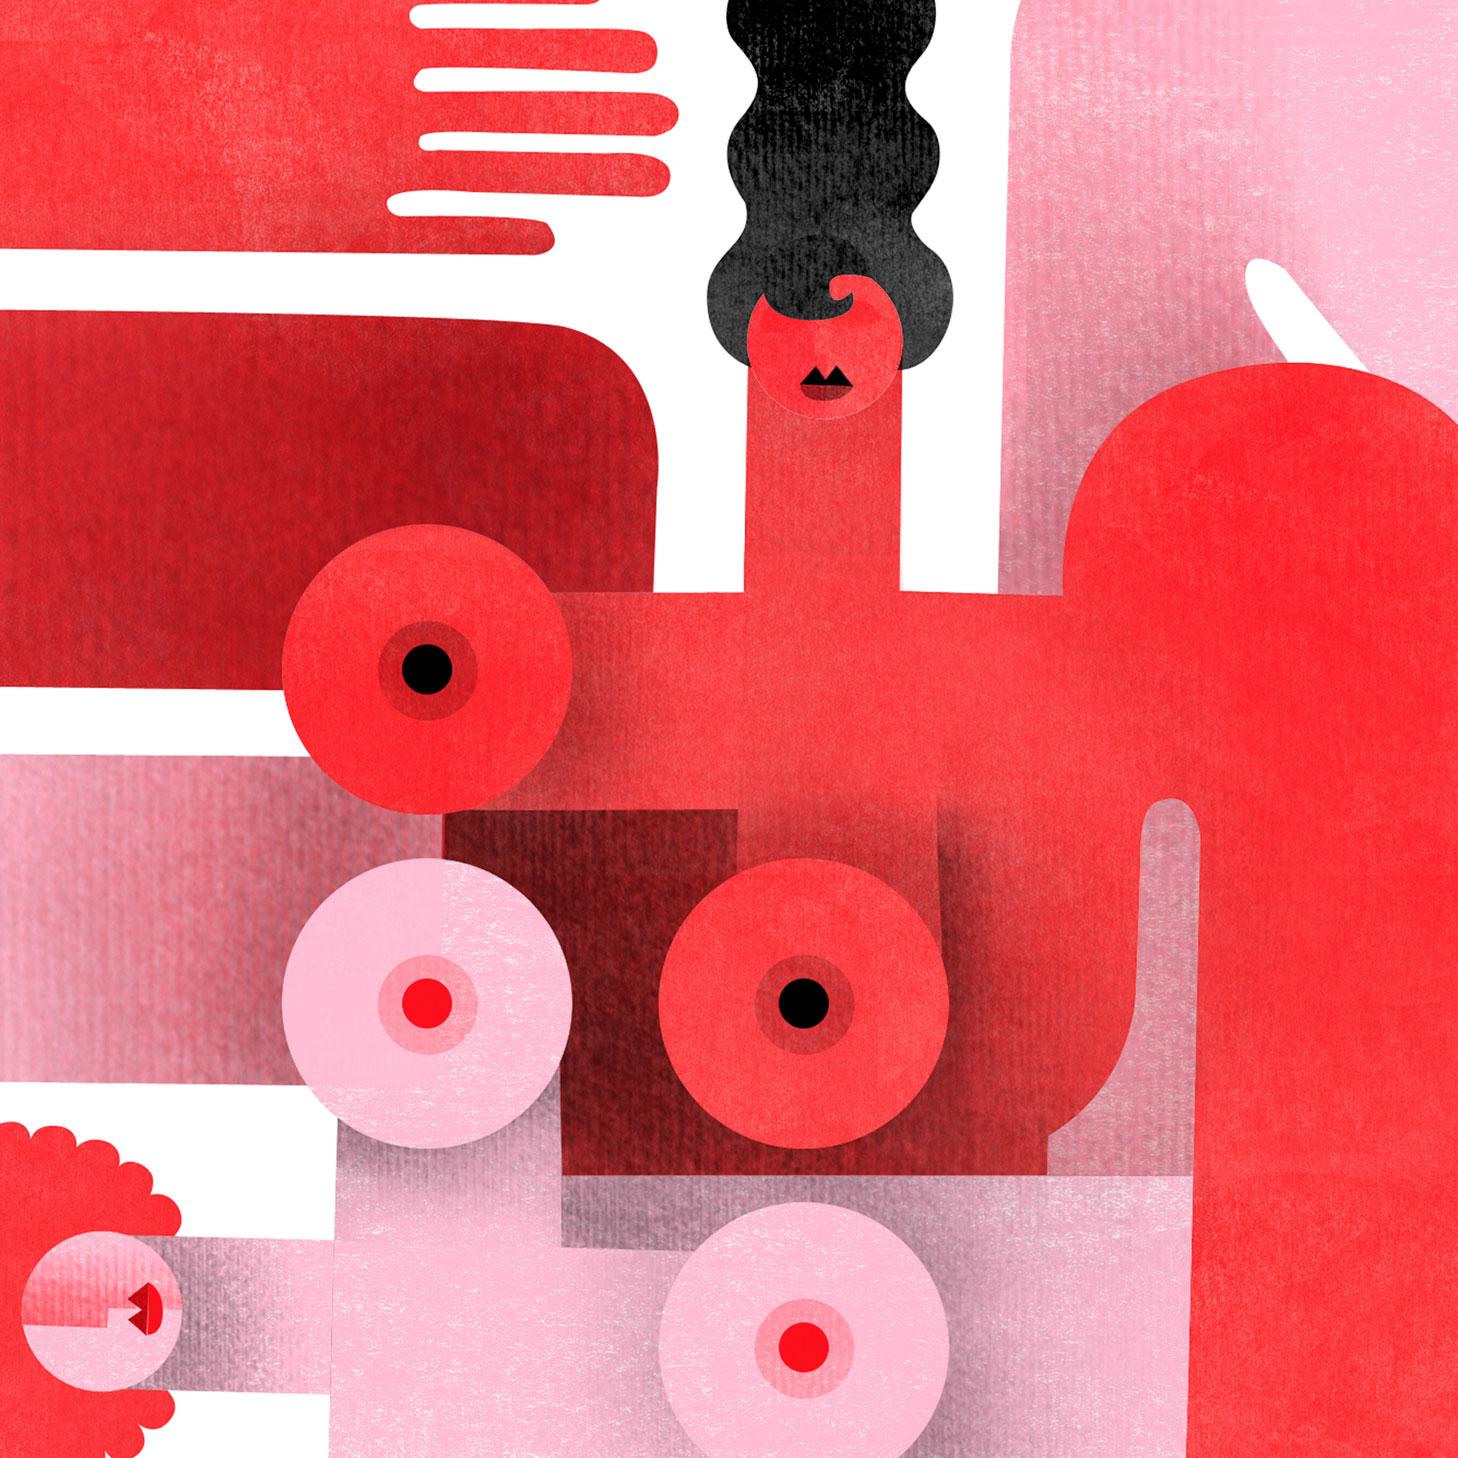 maria-corte-illustration-red-square